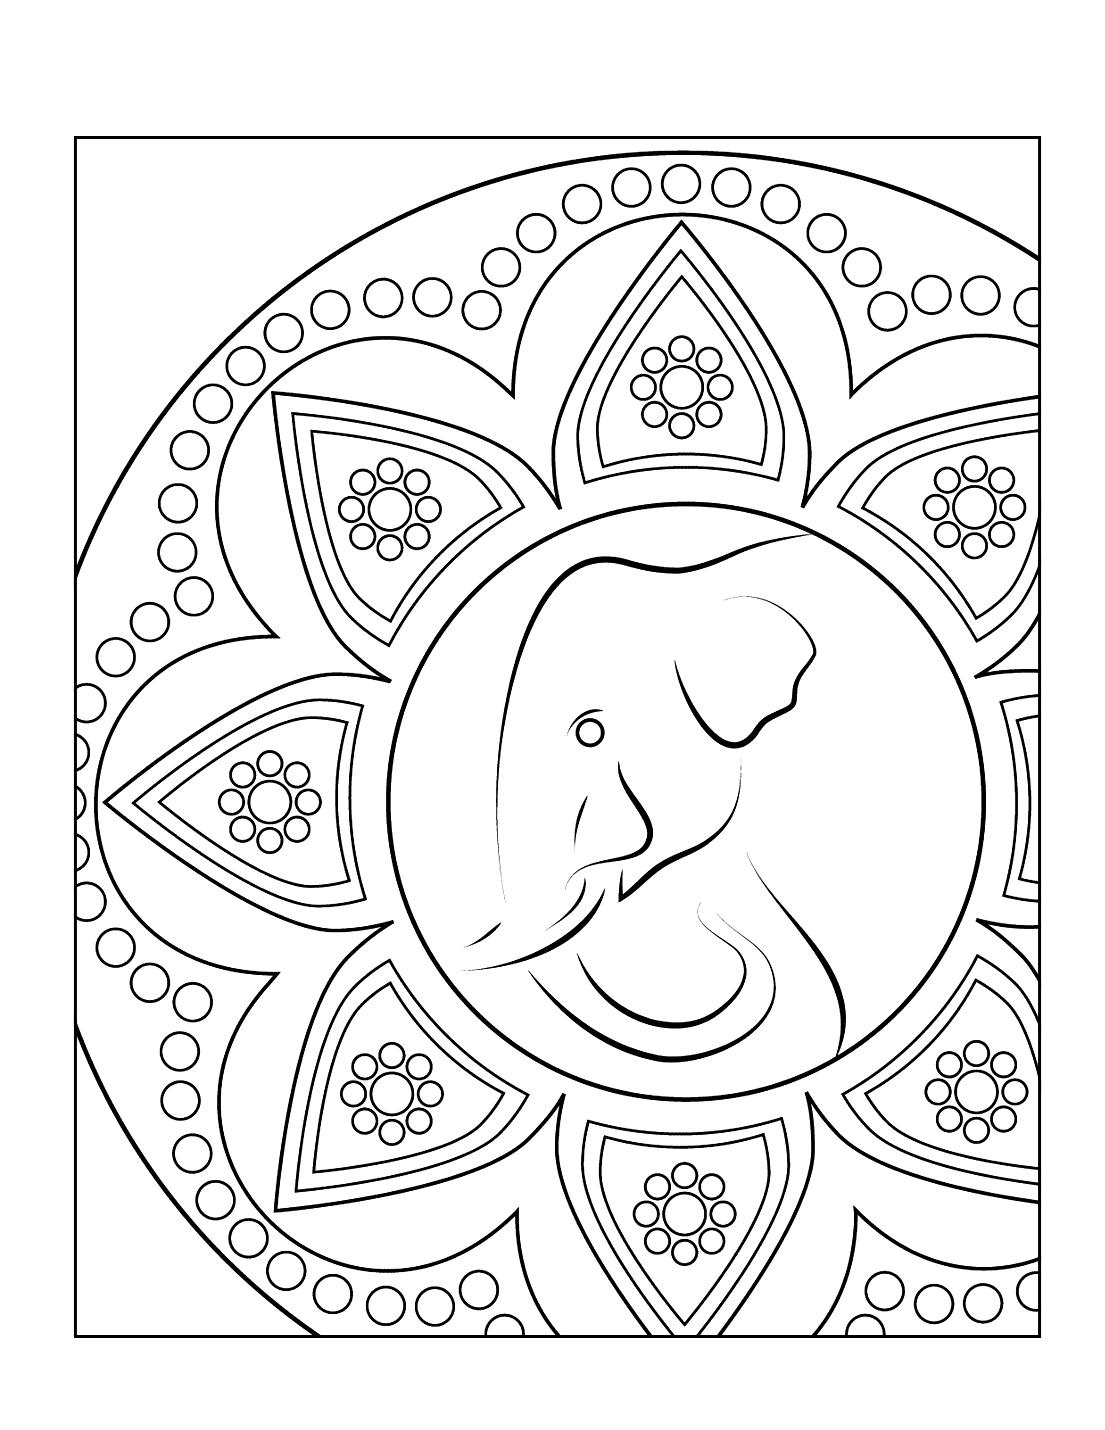 Diwali Coloring Pages Coloring Rocks